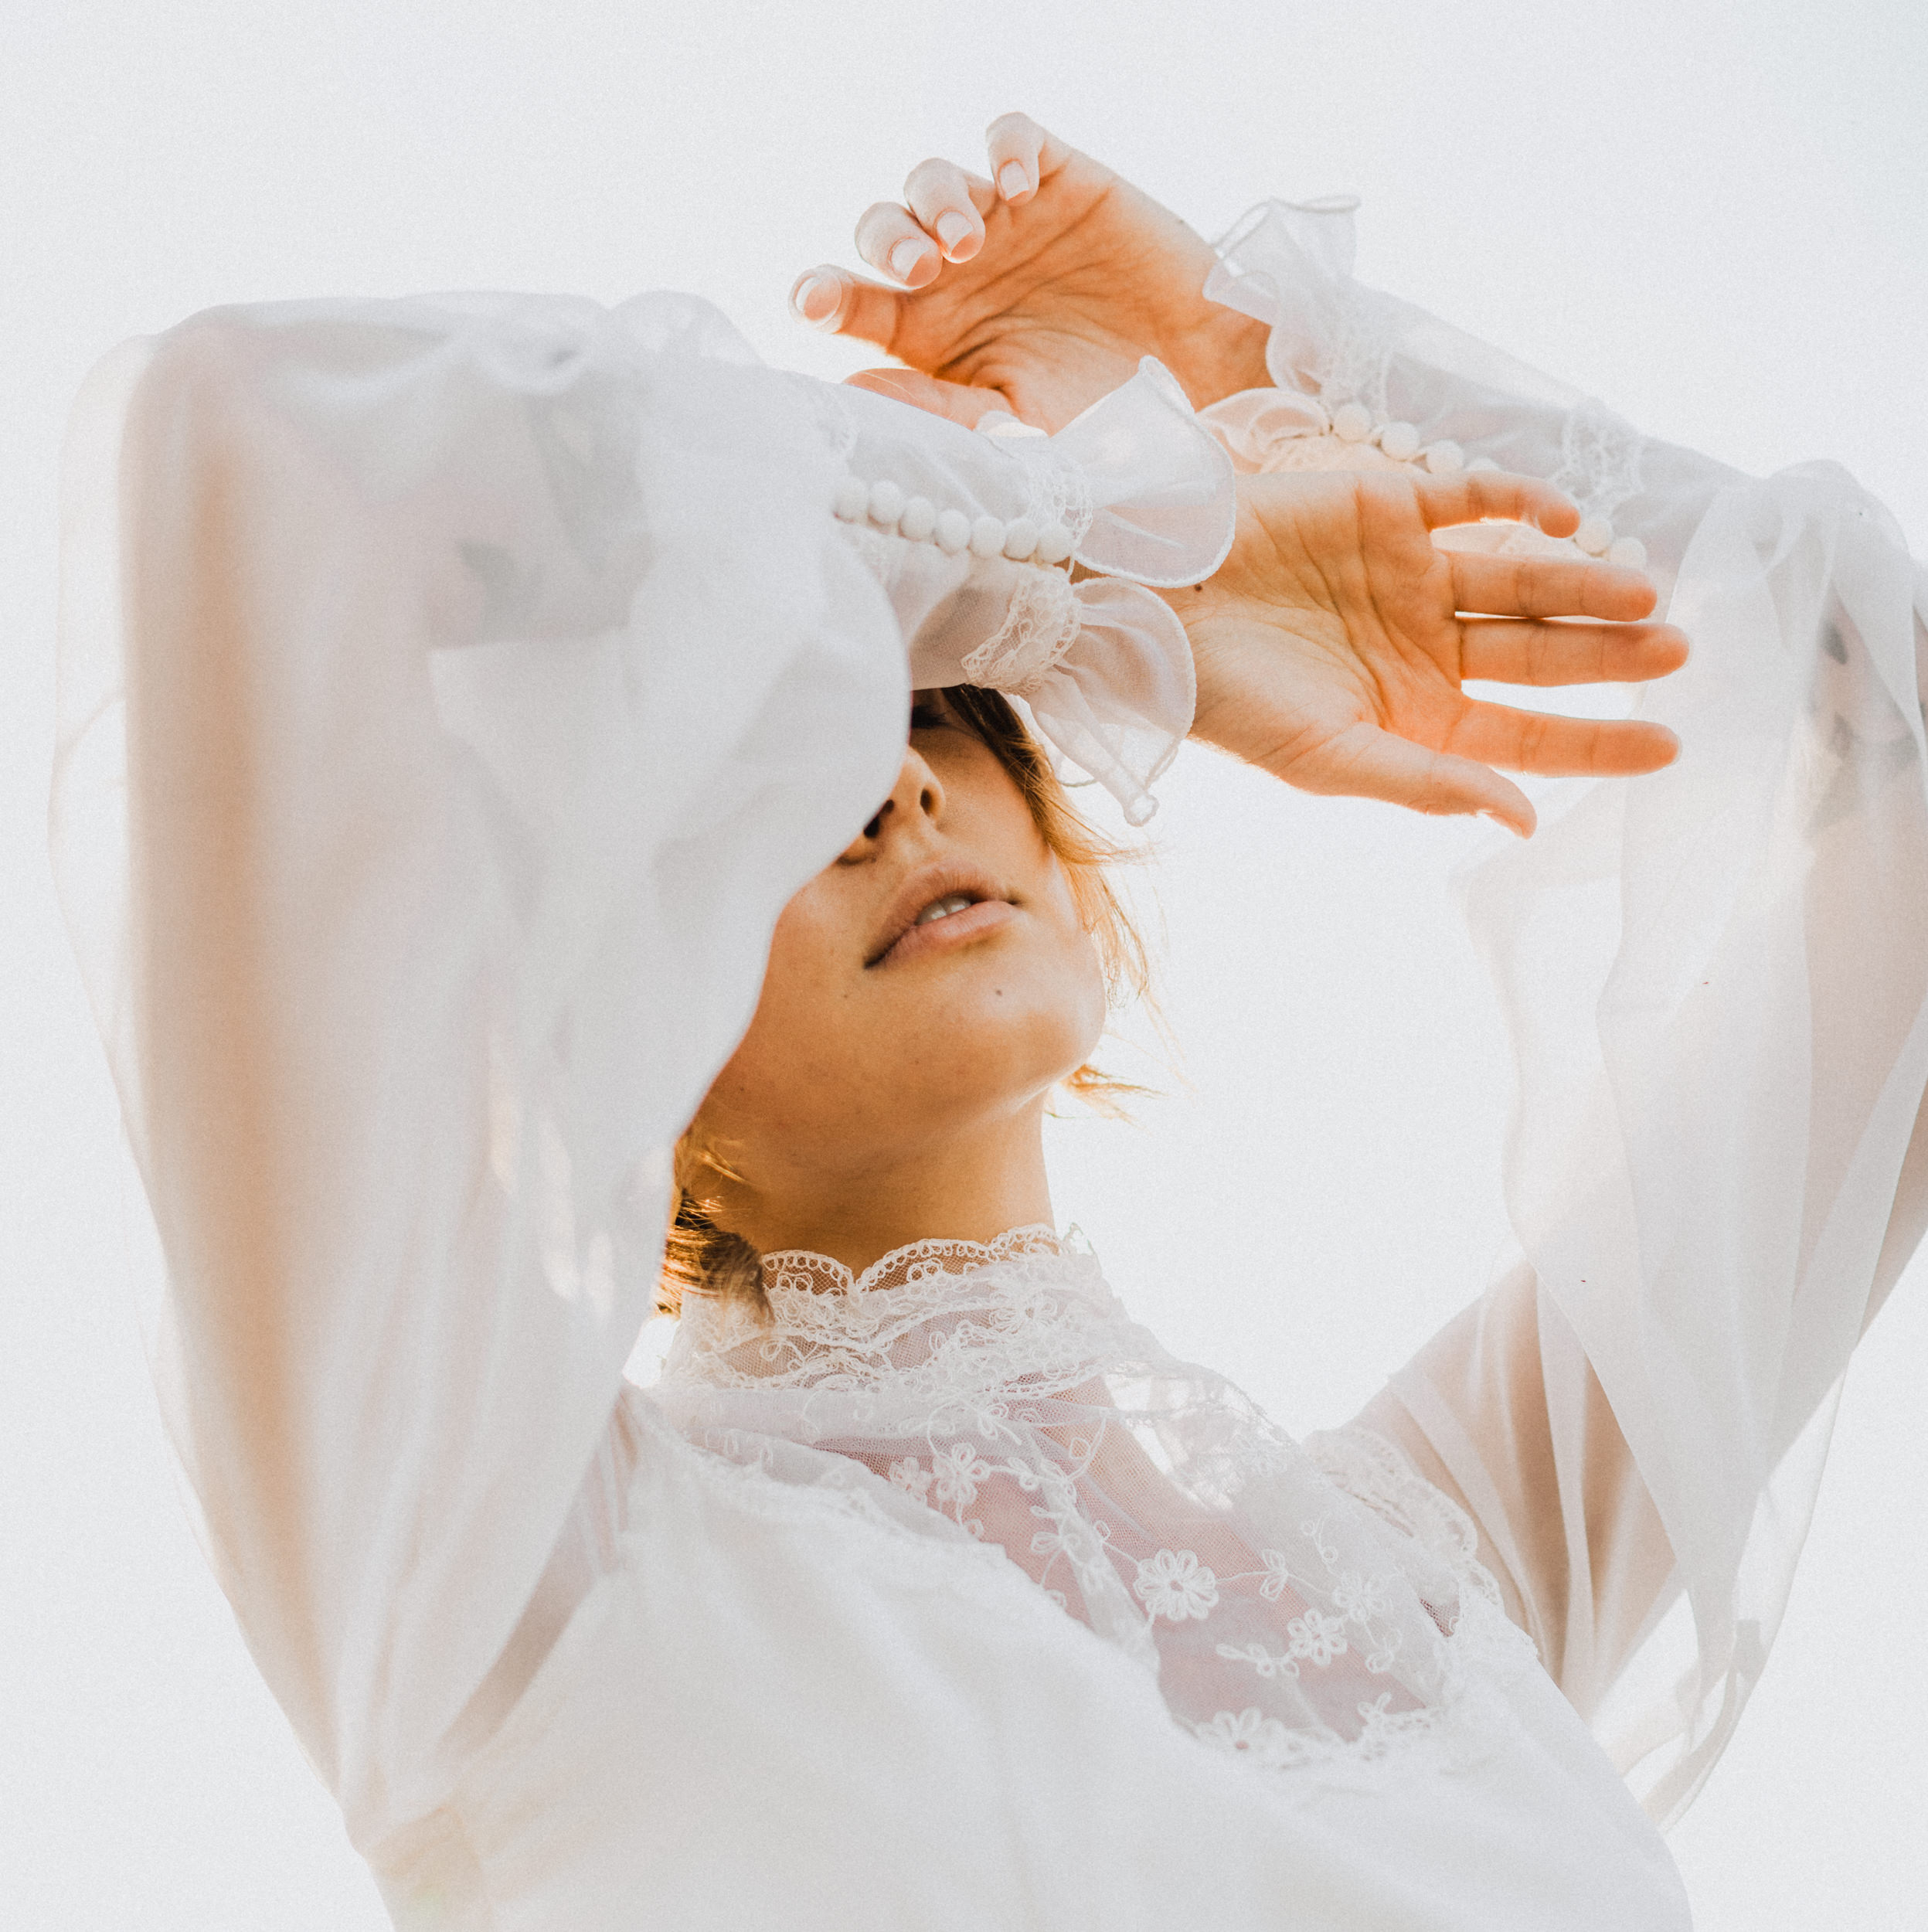 Palisade wedding dress photoshoot for Kagami Vintage with Western Slope wedding photographer Kimberly Crist